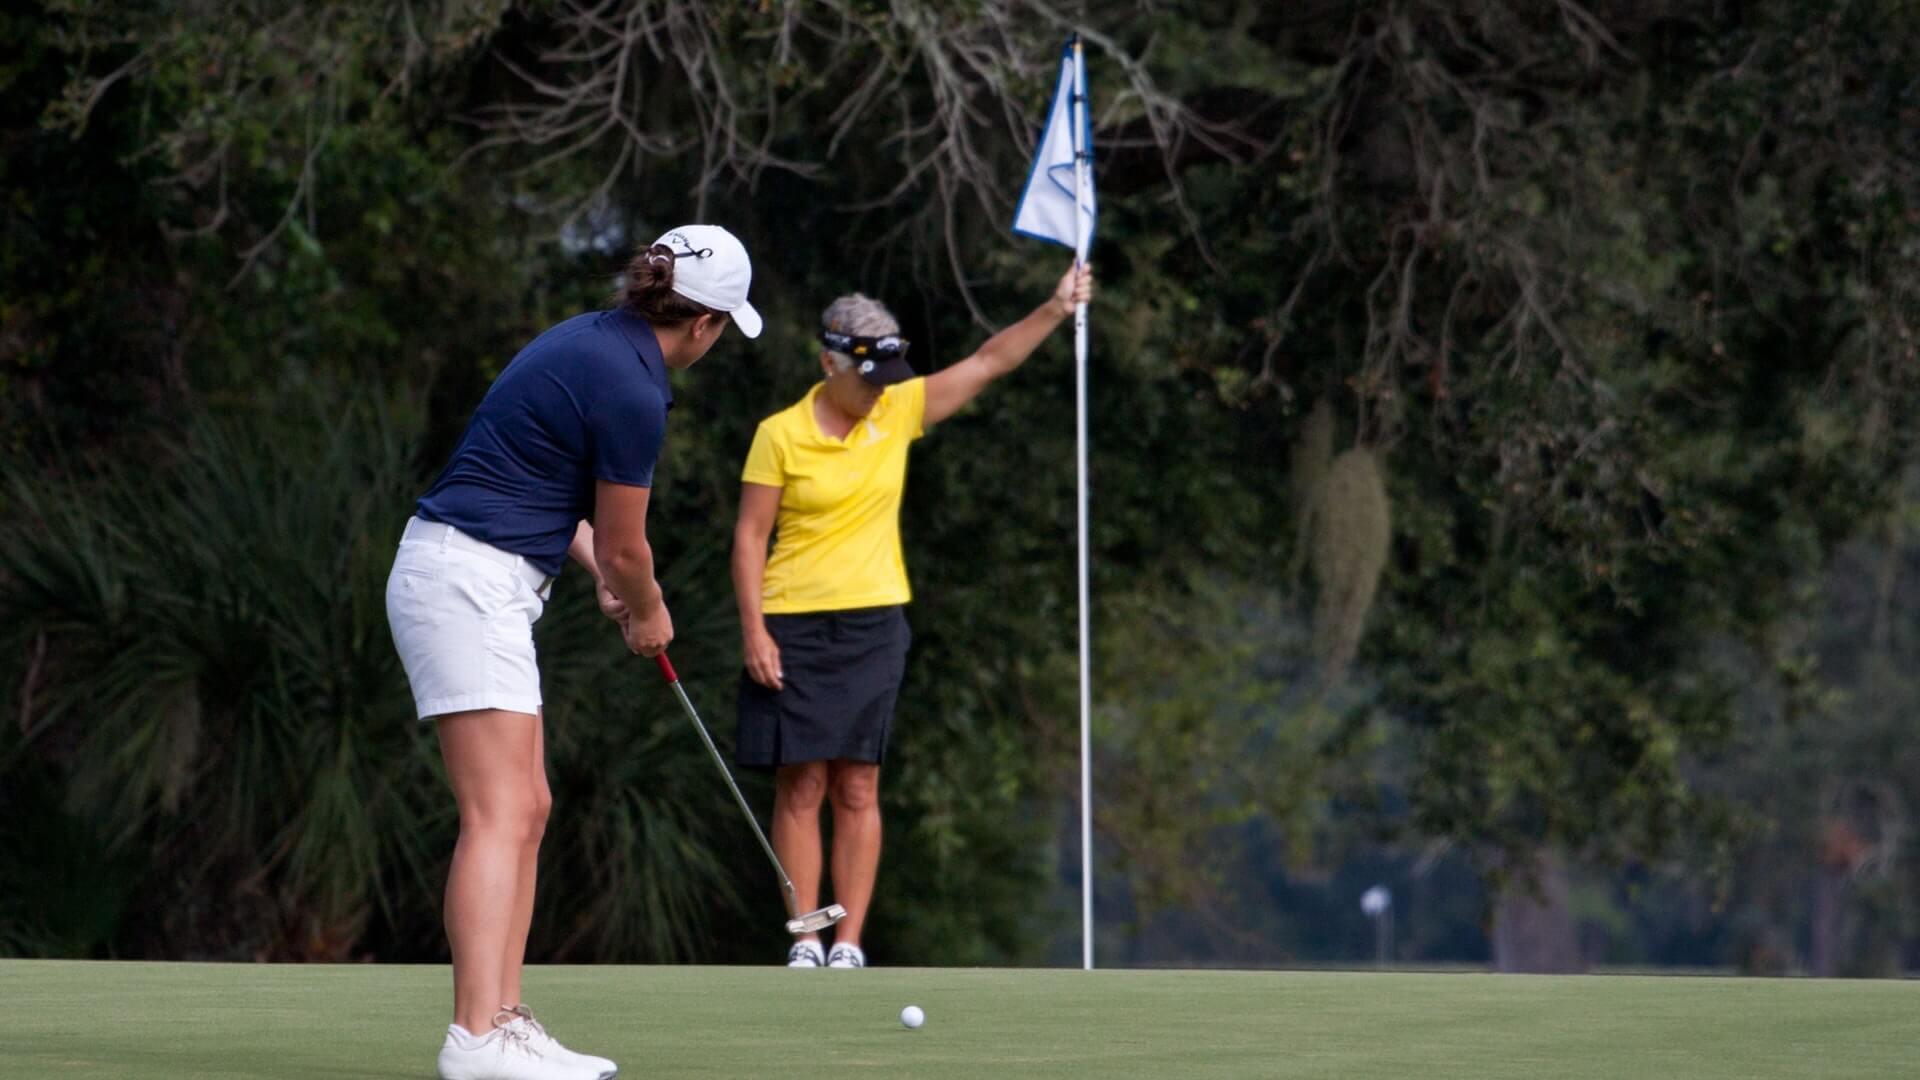 Rory McIlroy's enjoyable best bunker club Golf